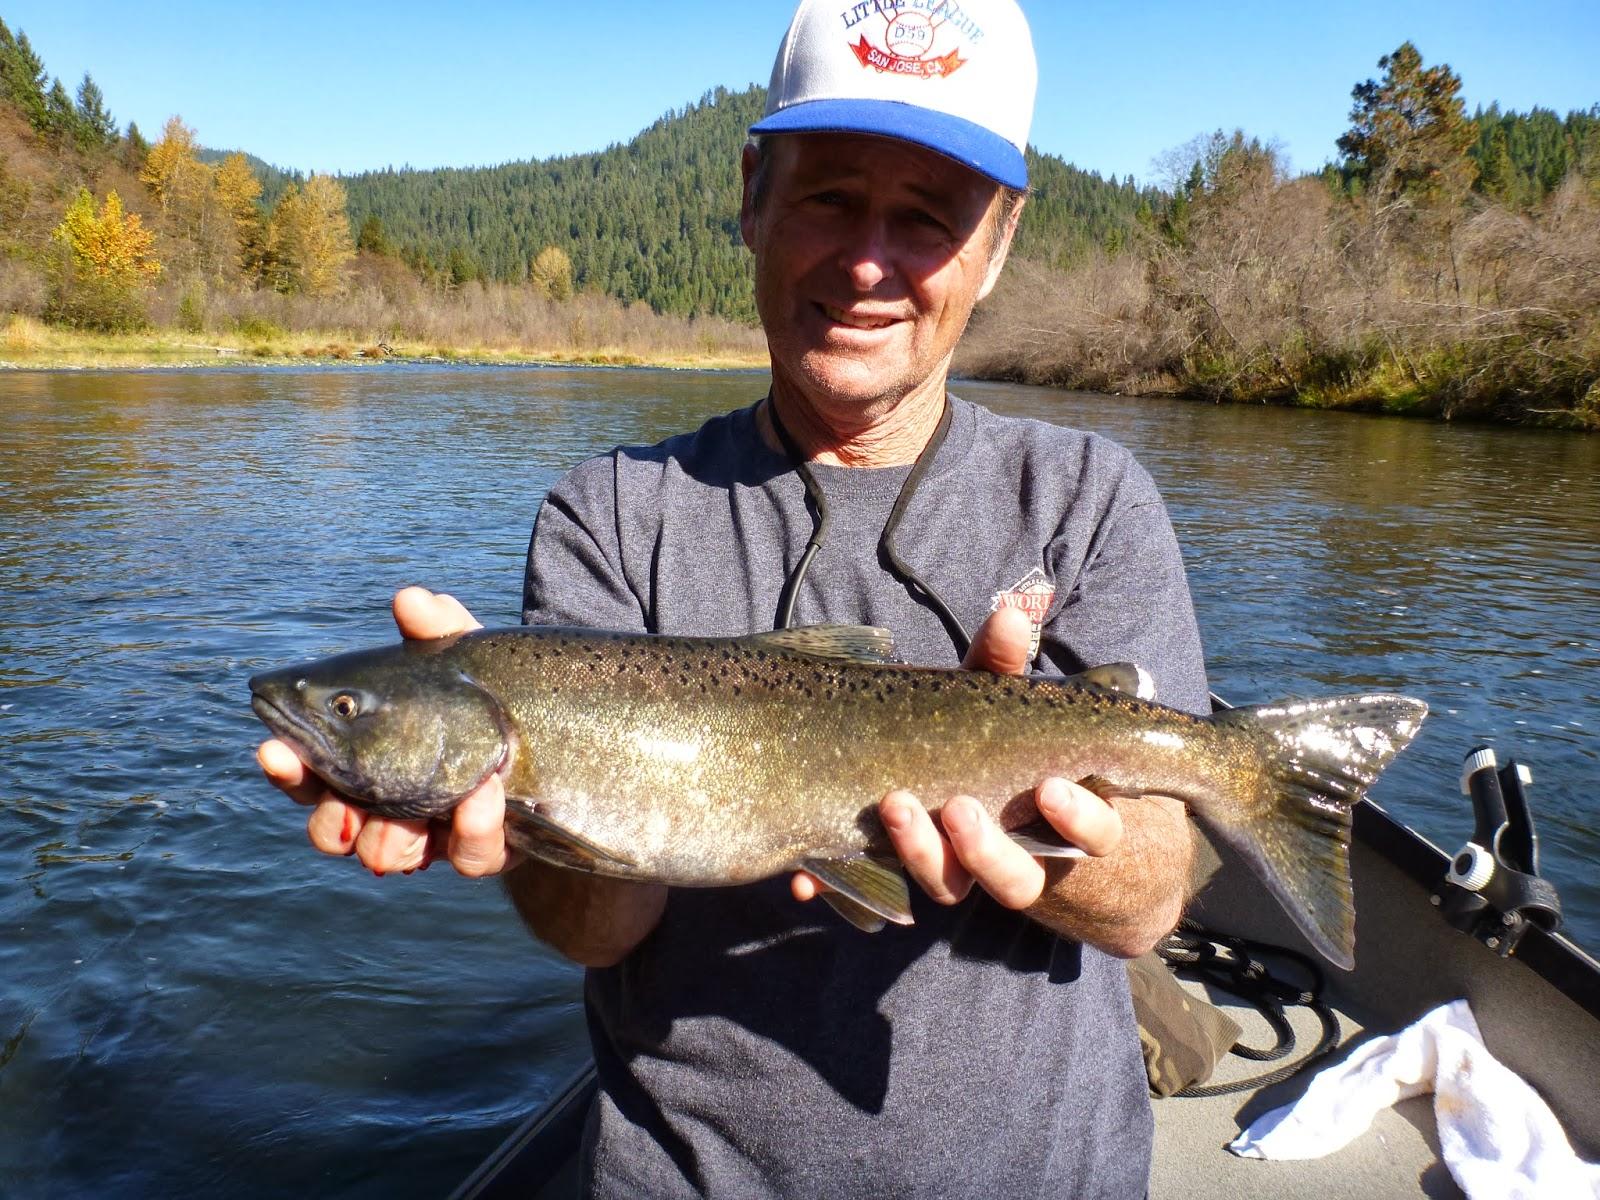 Ironhead guide service 530 598 0530 premier klamath river for Steelhead fishing california